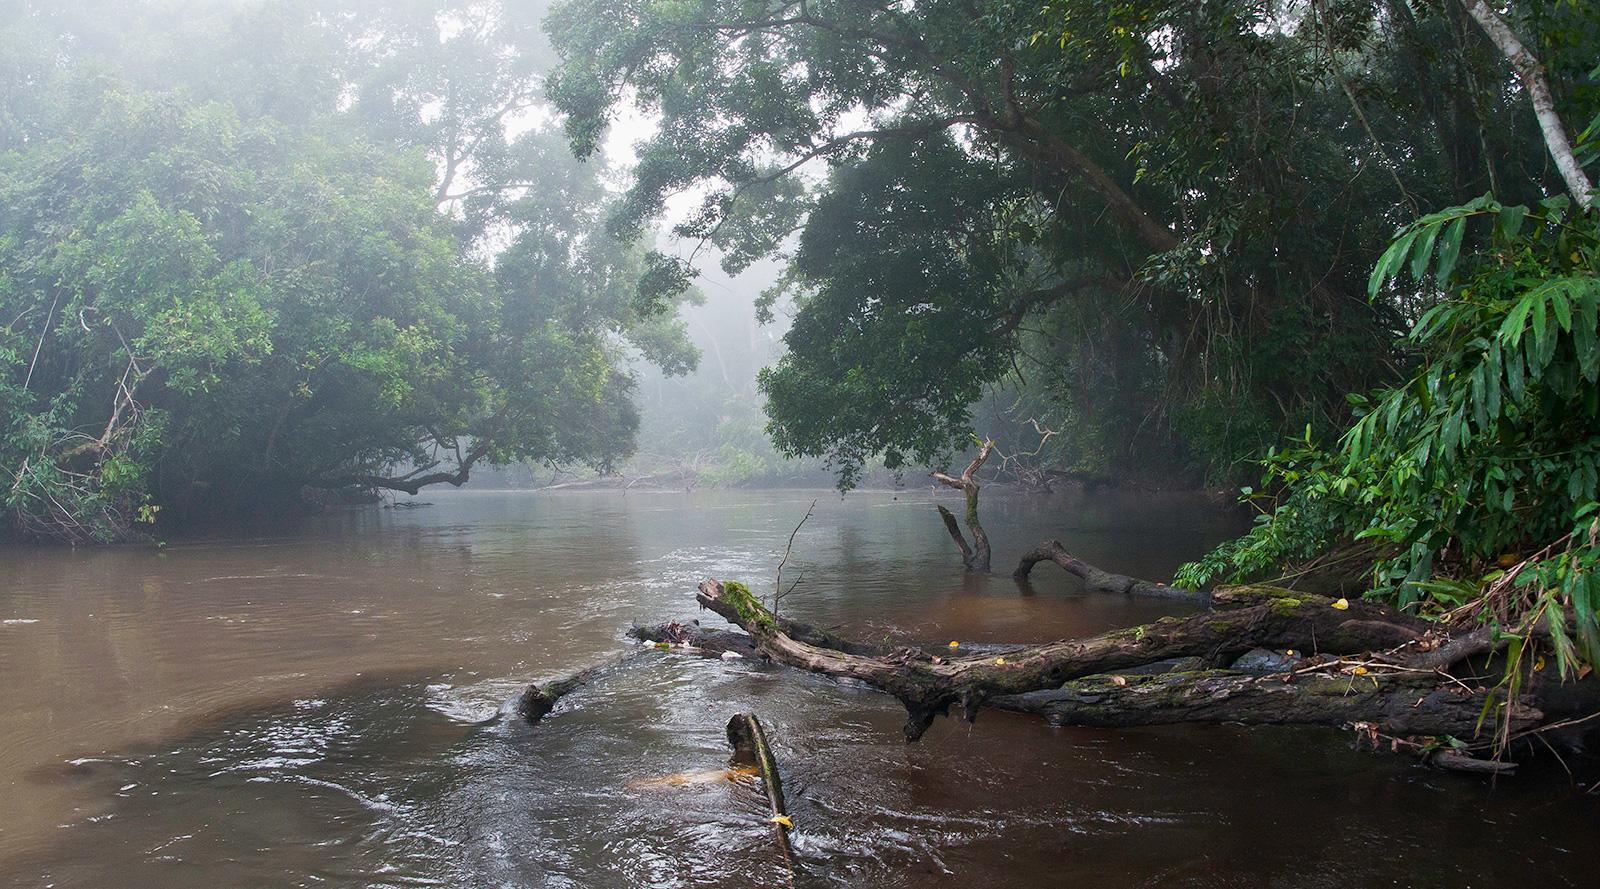 © Wilderness Safaris | Odzala, Congo